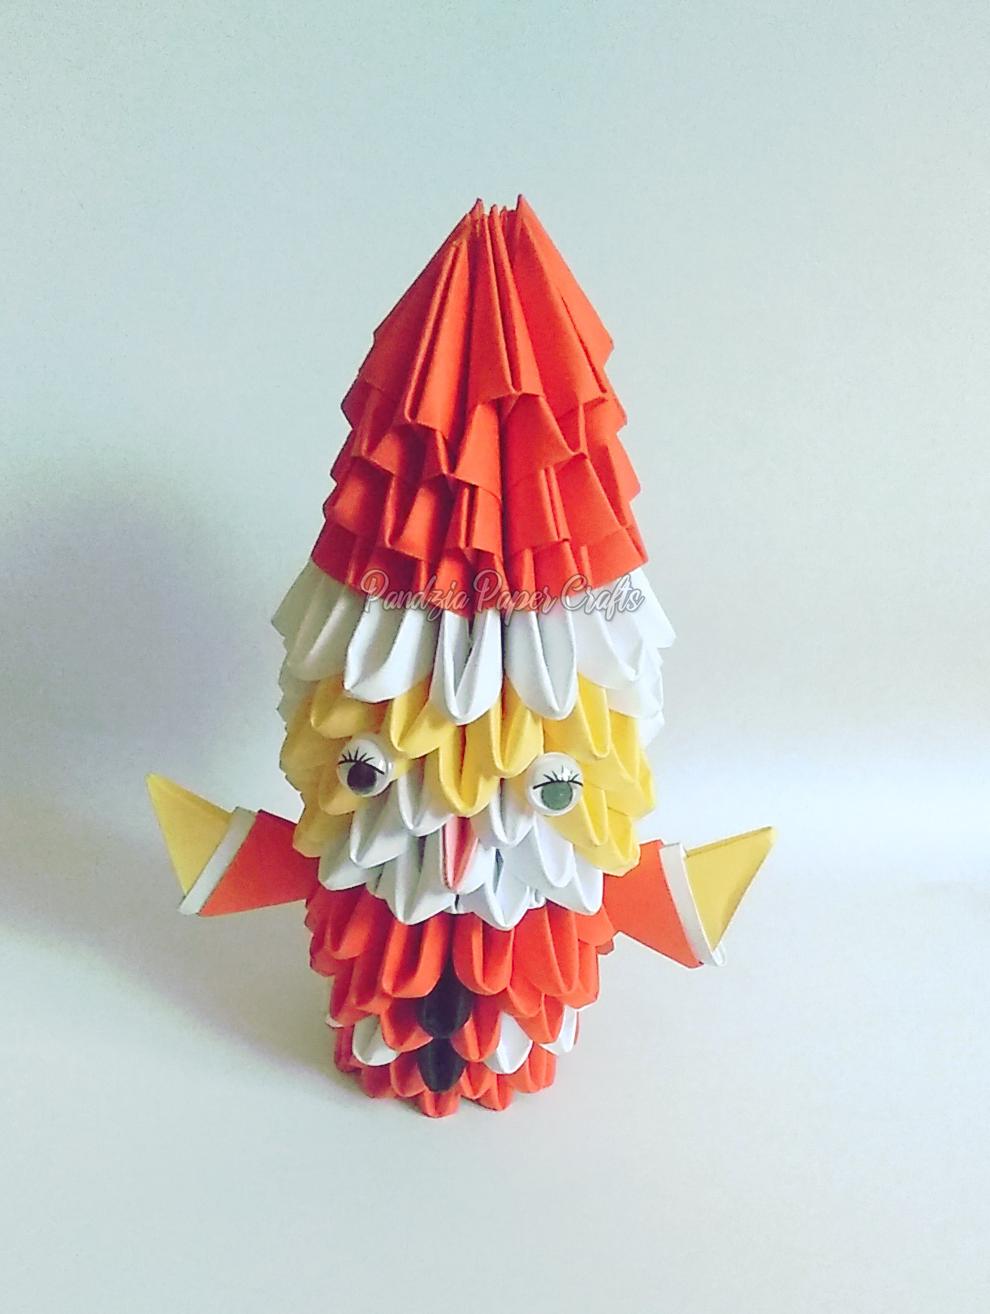 3D origami Santa Claus tutorial part 1 - YouTube | 1314x990